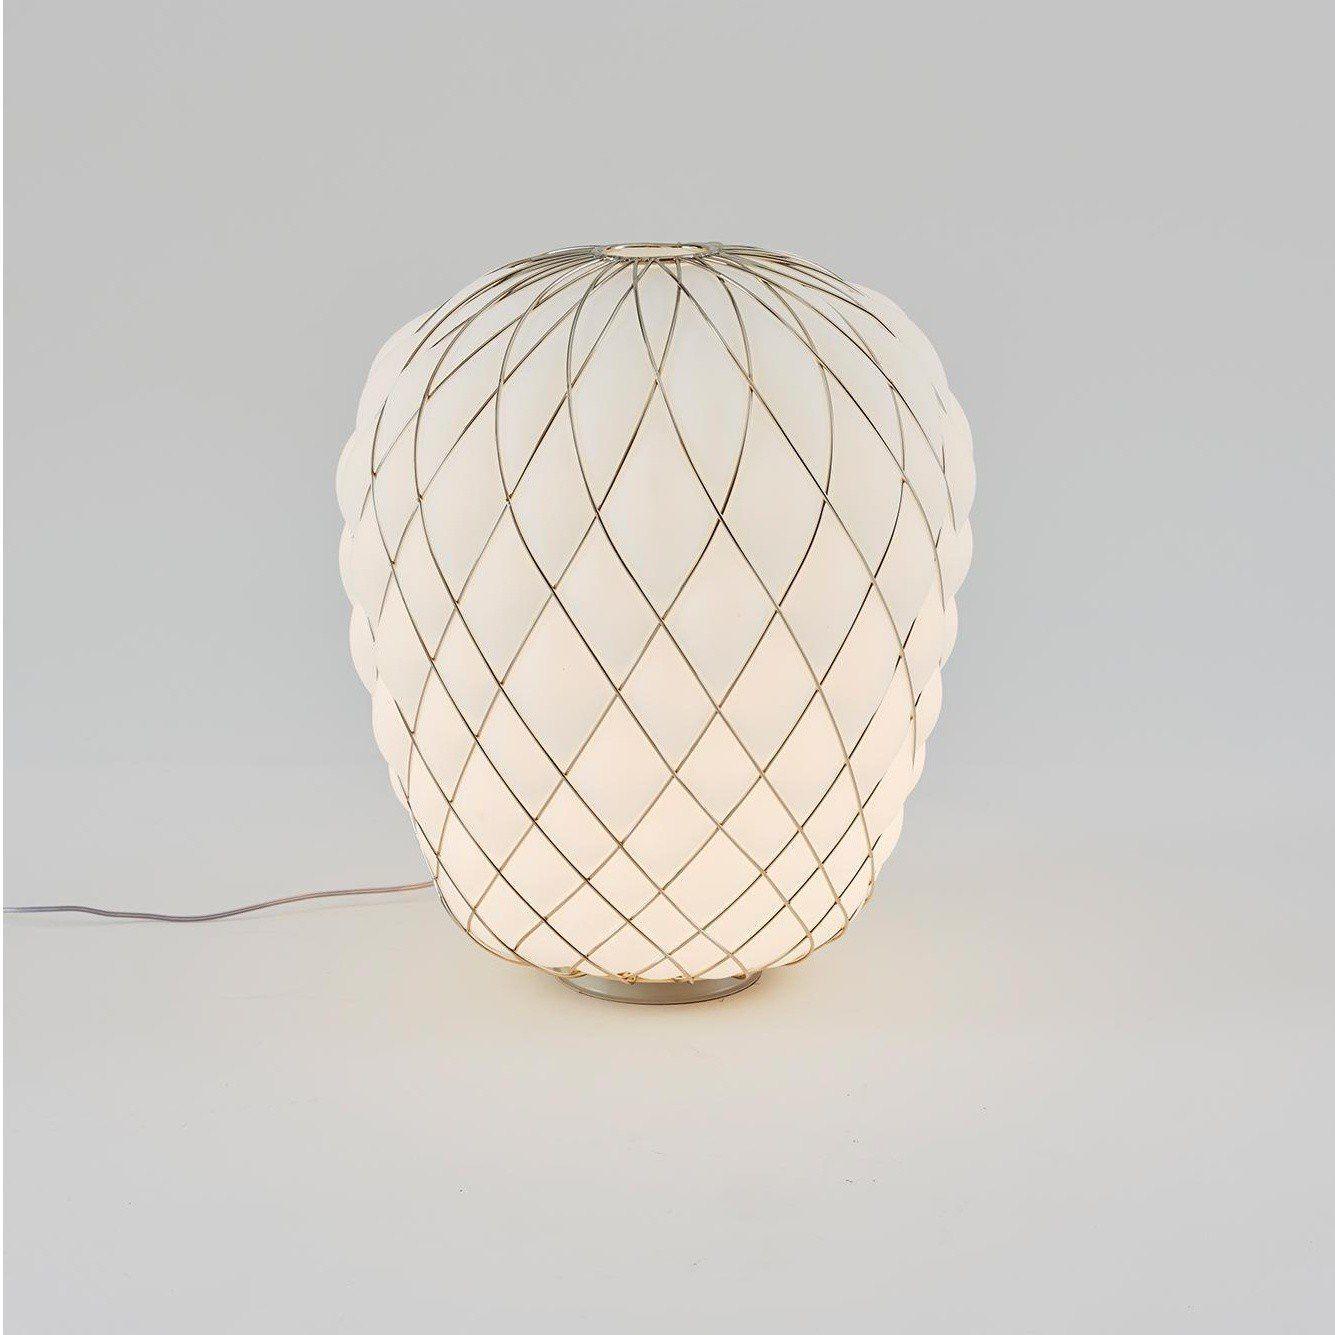 Pinecone lampe de table fontana arte for Pinecone fontana